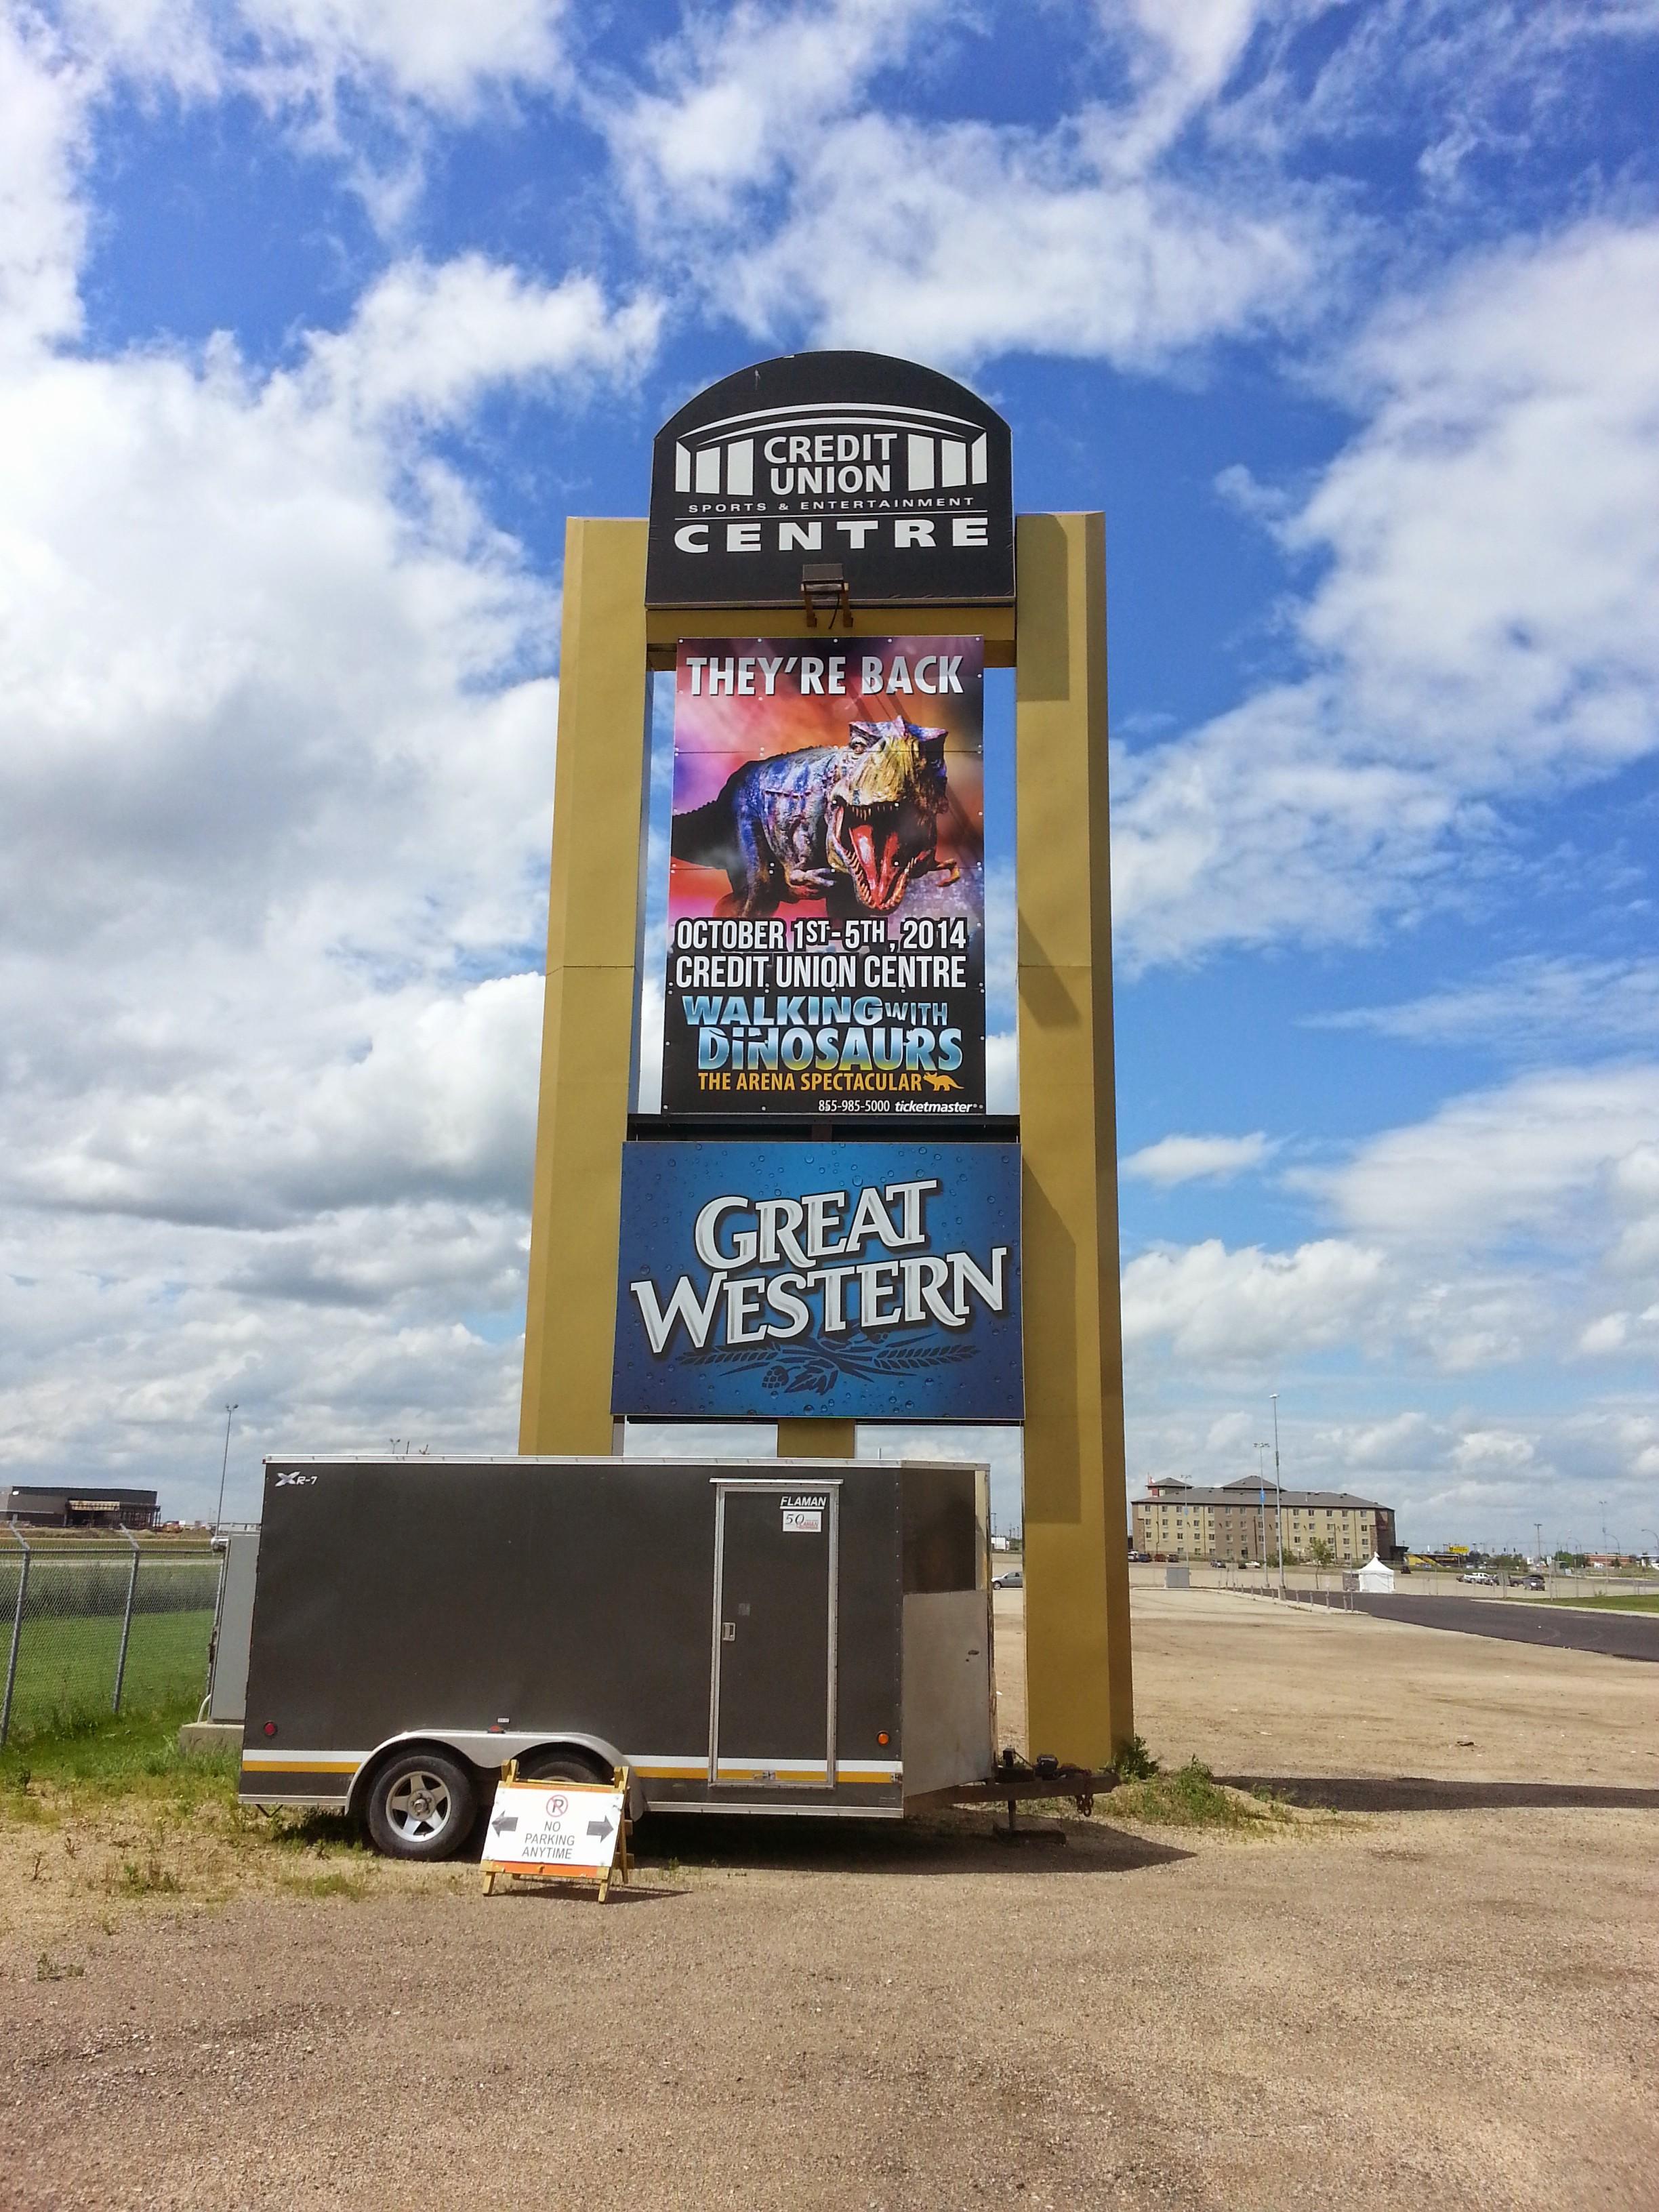 Credit Union Centre, Saskatoon